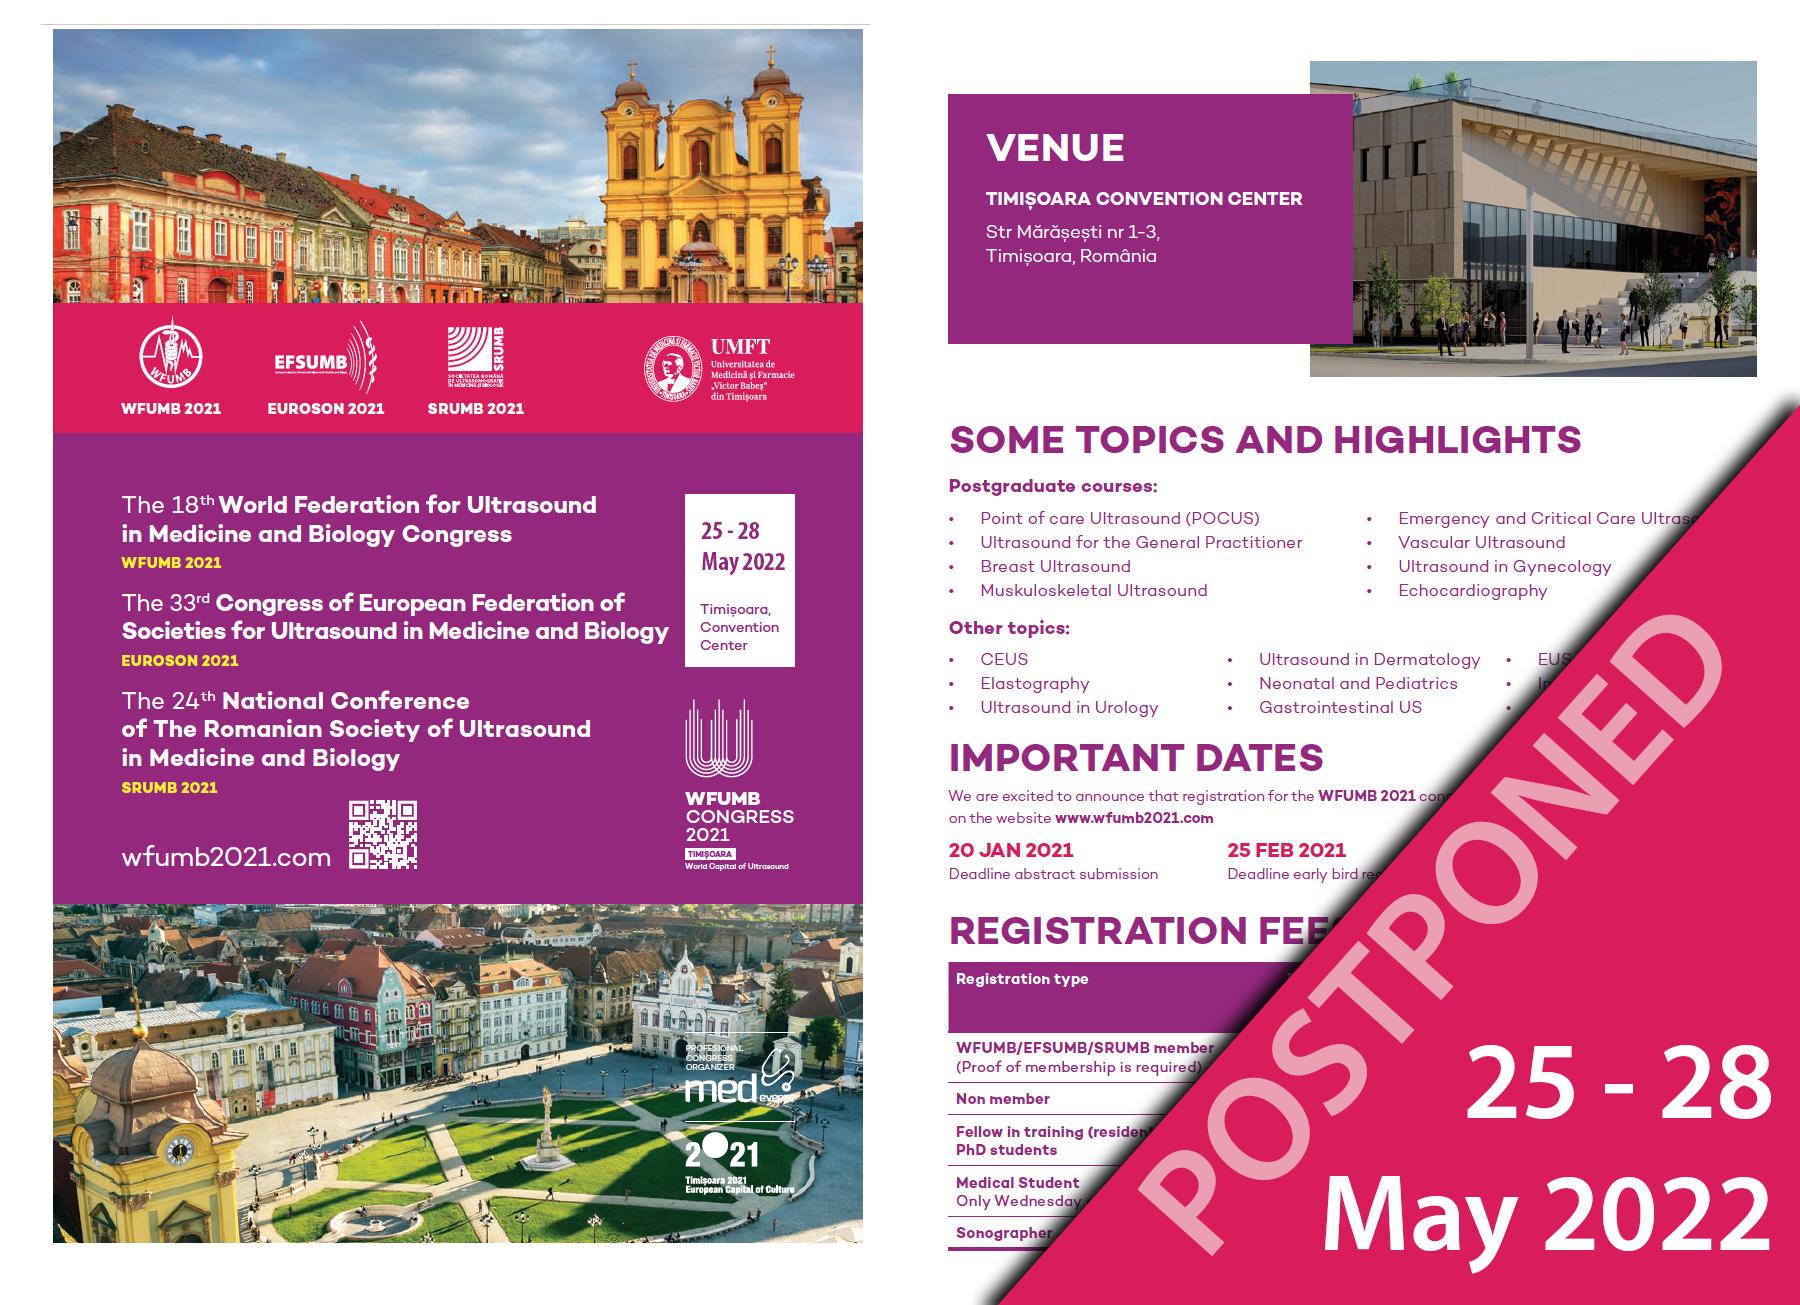 WFUMB 2021, Timisoara<BR/> NOW POSTPONED TO 25 - 28 May 2022